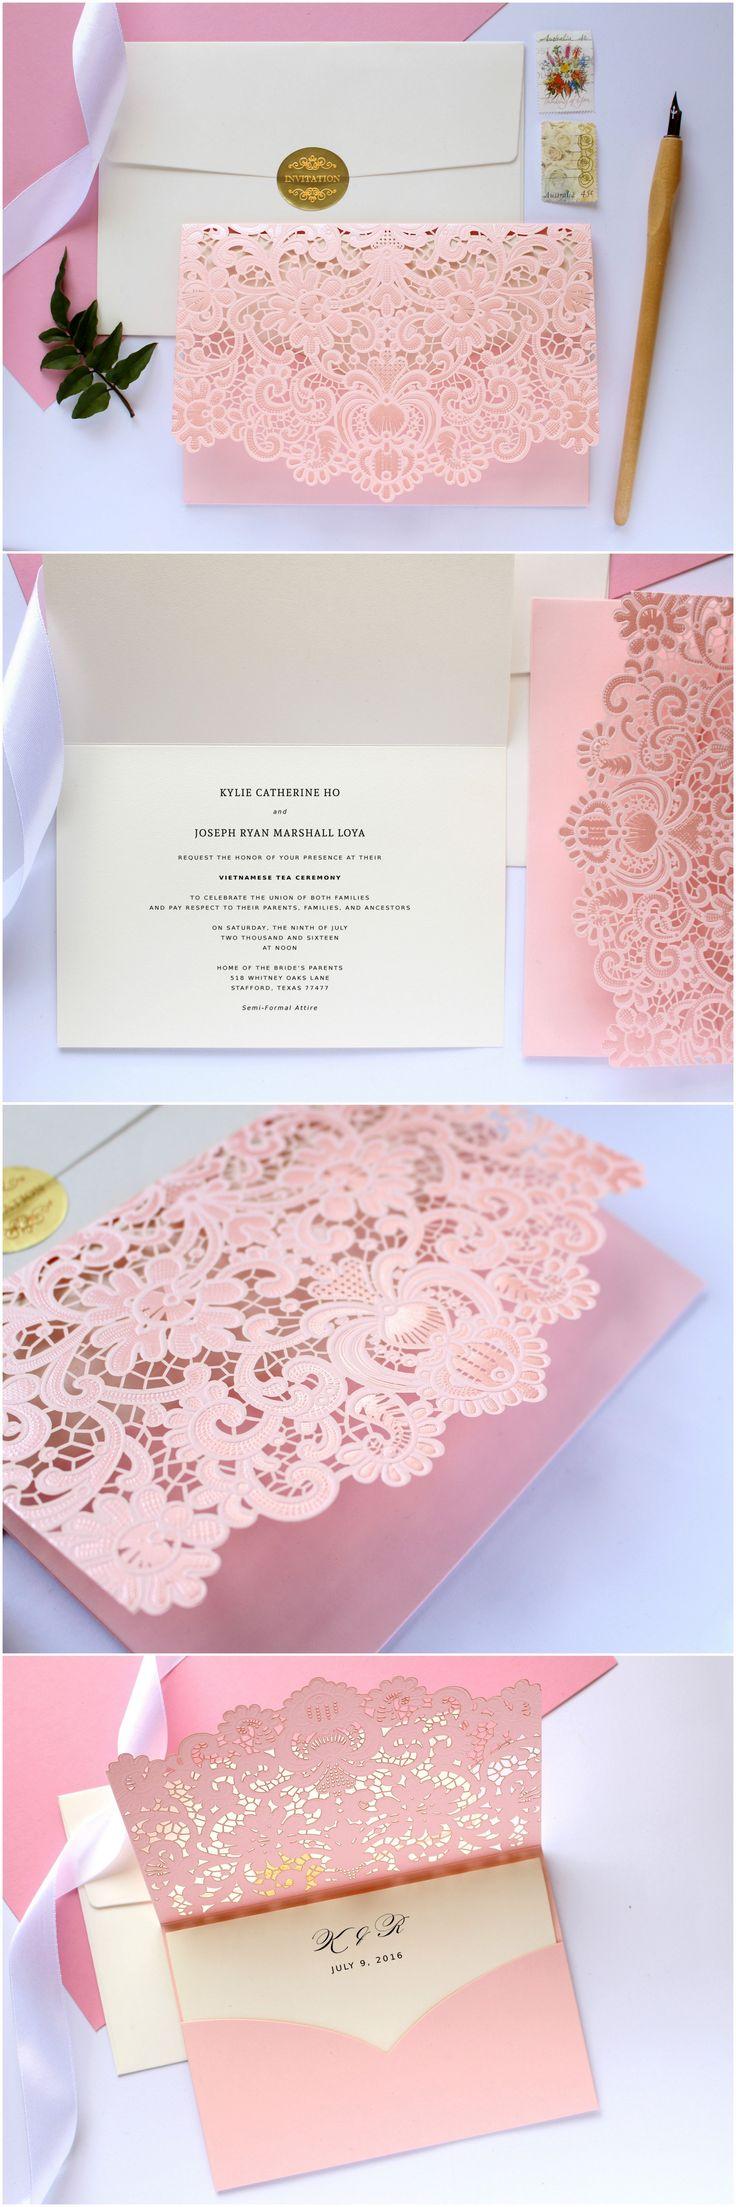 luxury wedding invitations pink wedding invitations Pink Wedding Invitations Blush Wedding Invitation Blush Pink Wedding Laser Cut Wedding Invitations Laser Cut Invitation